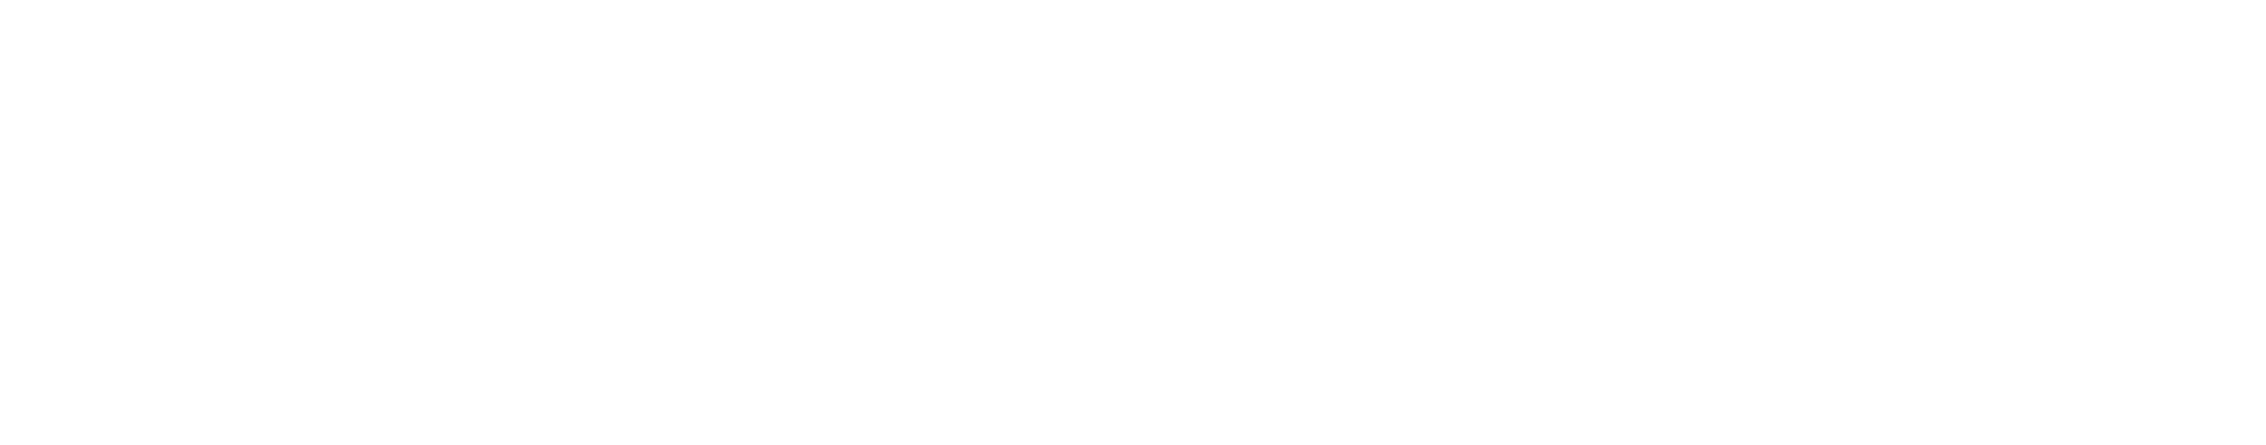 CUFM de Monterrey